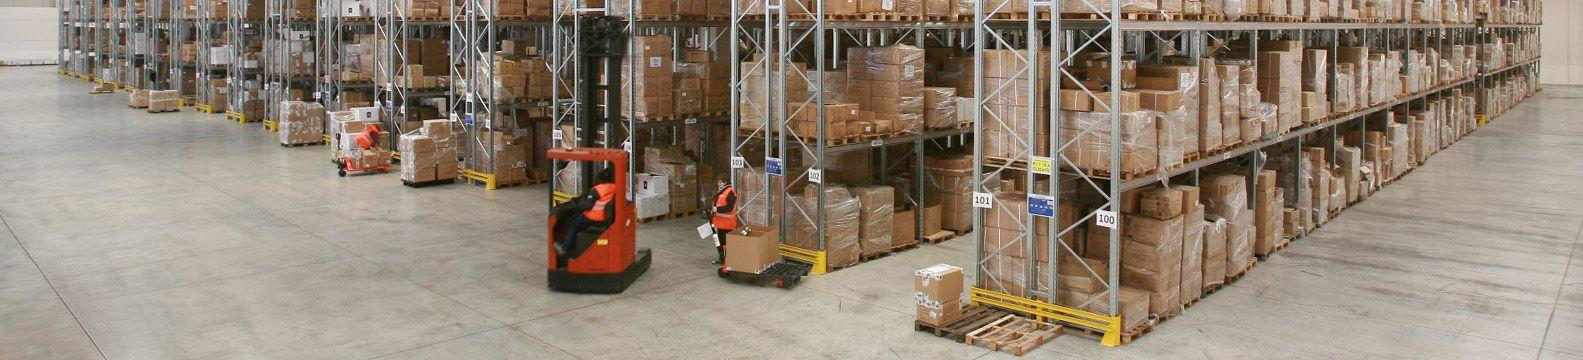 Servizi logistici per aziende